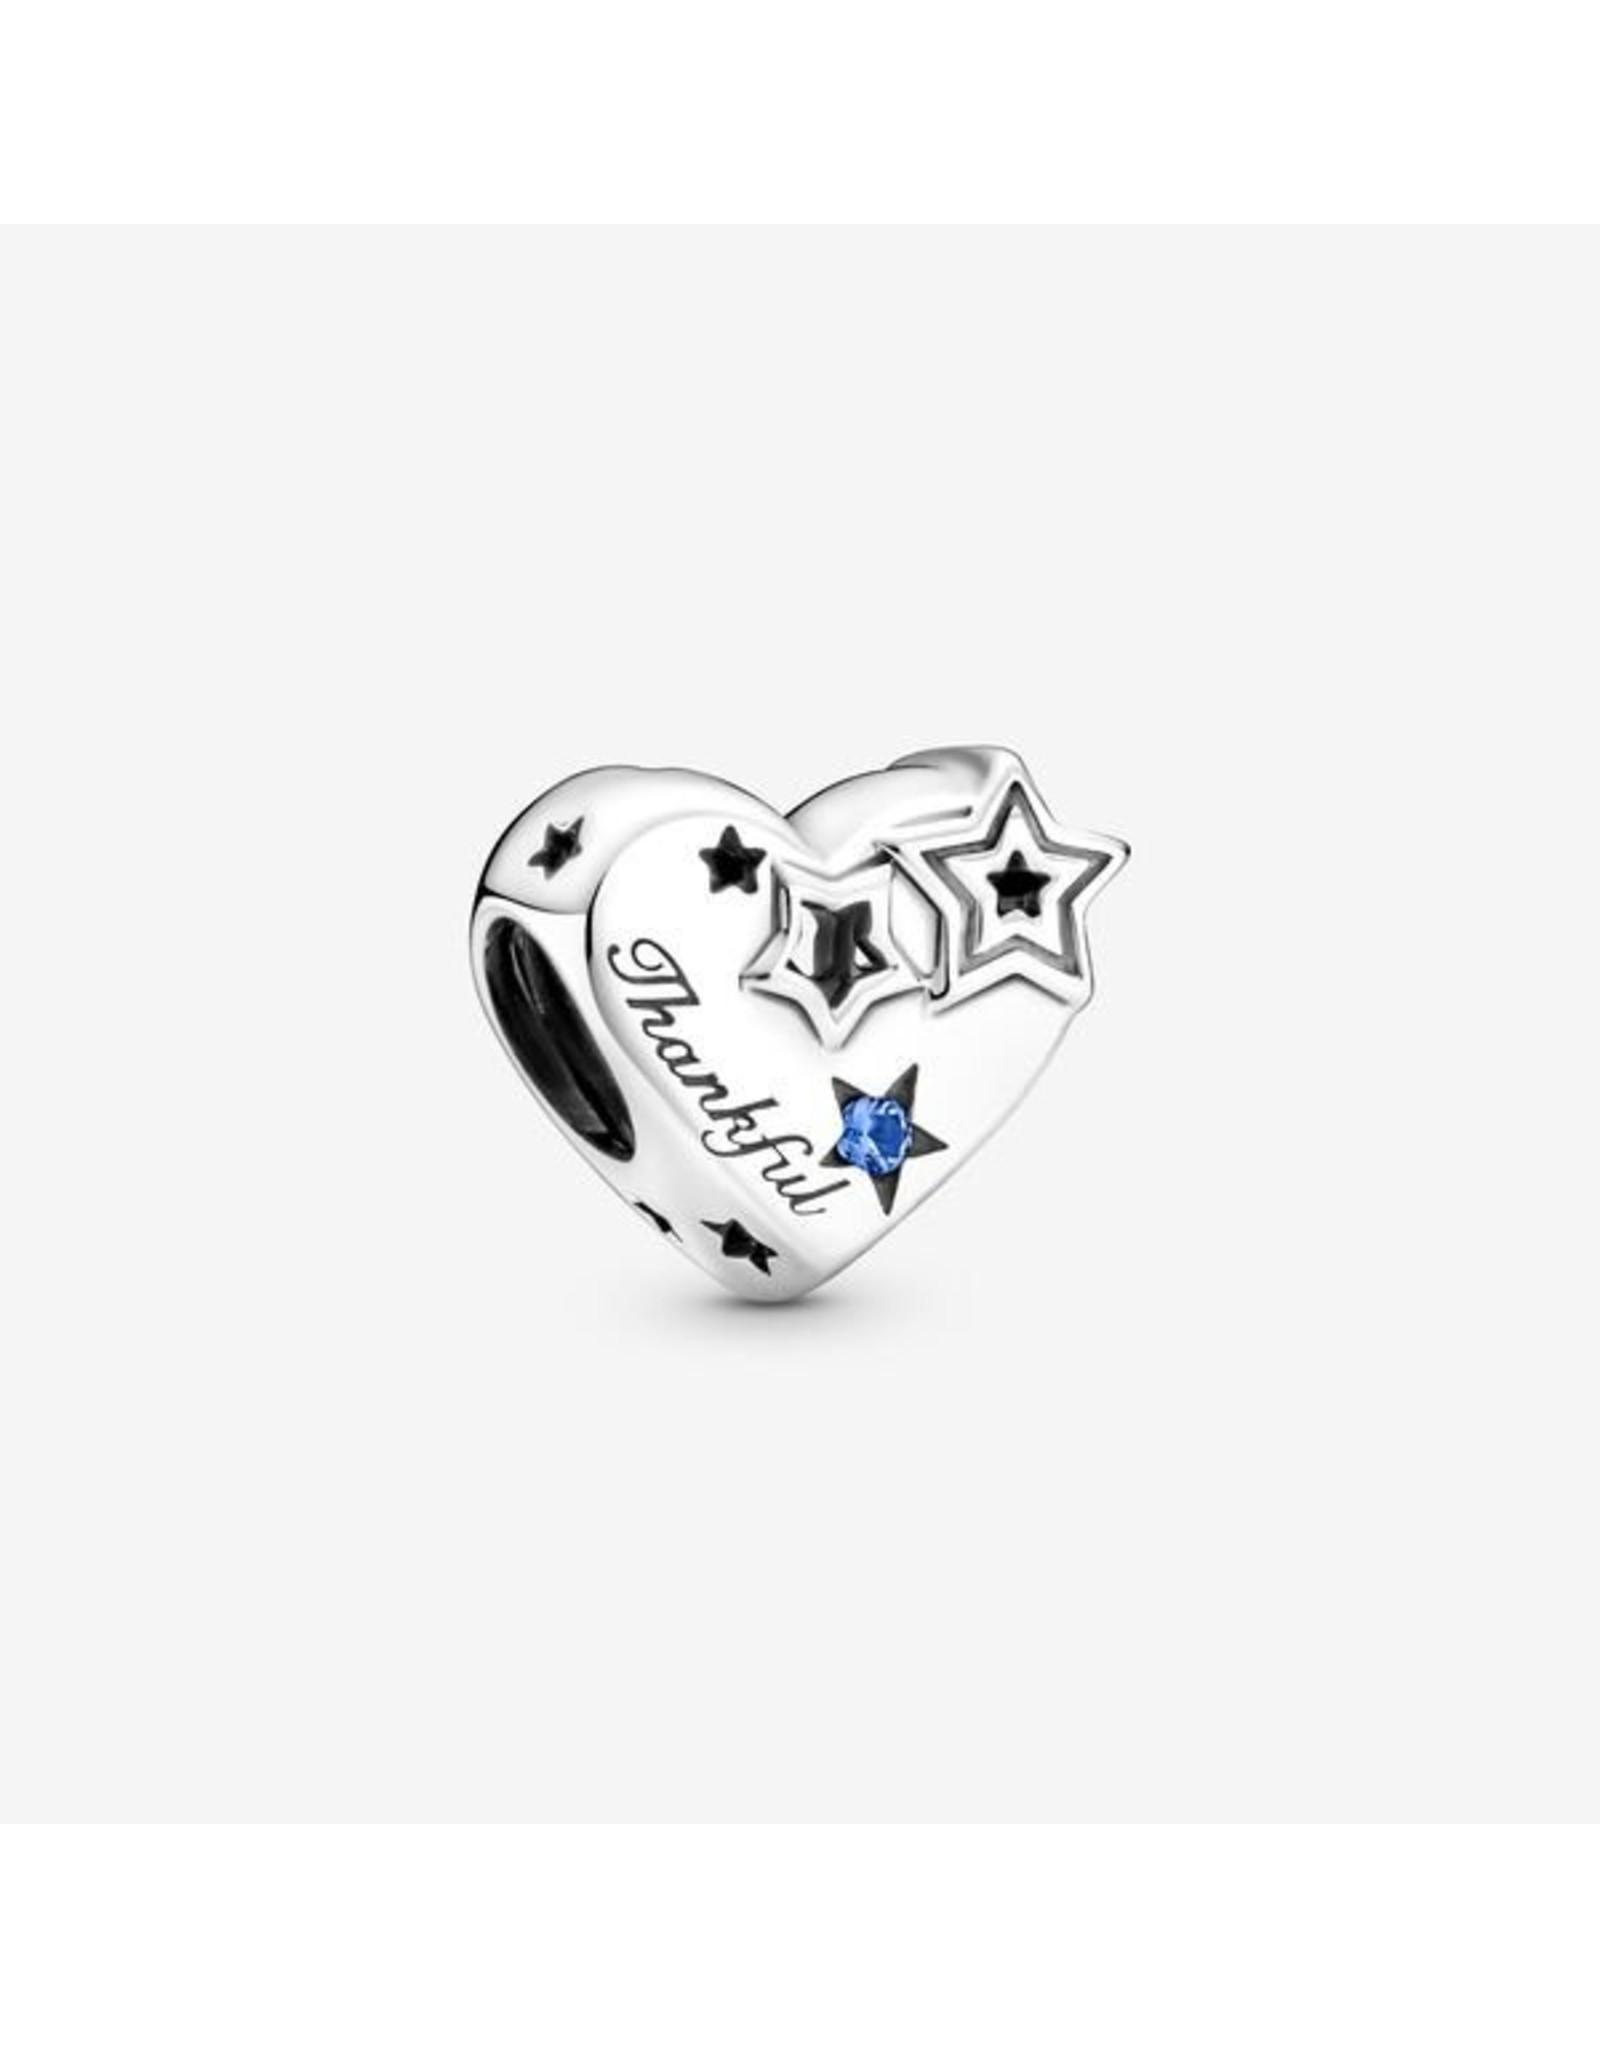 Pandora Pandora Charm,799527C01, Thankful Heart & Stars, Blue Crystal